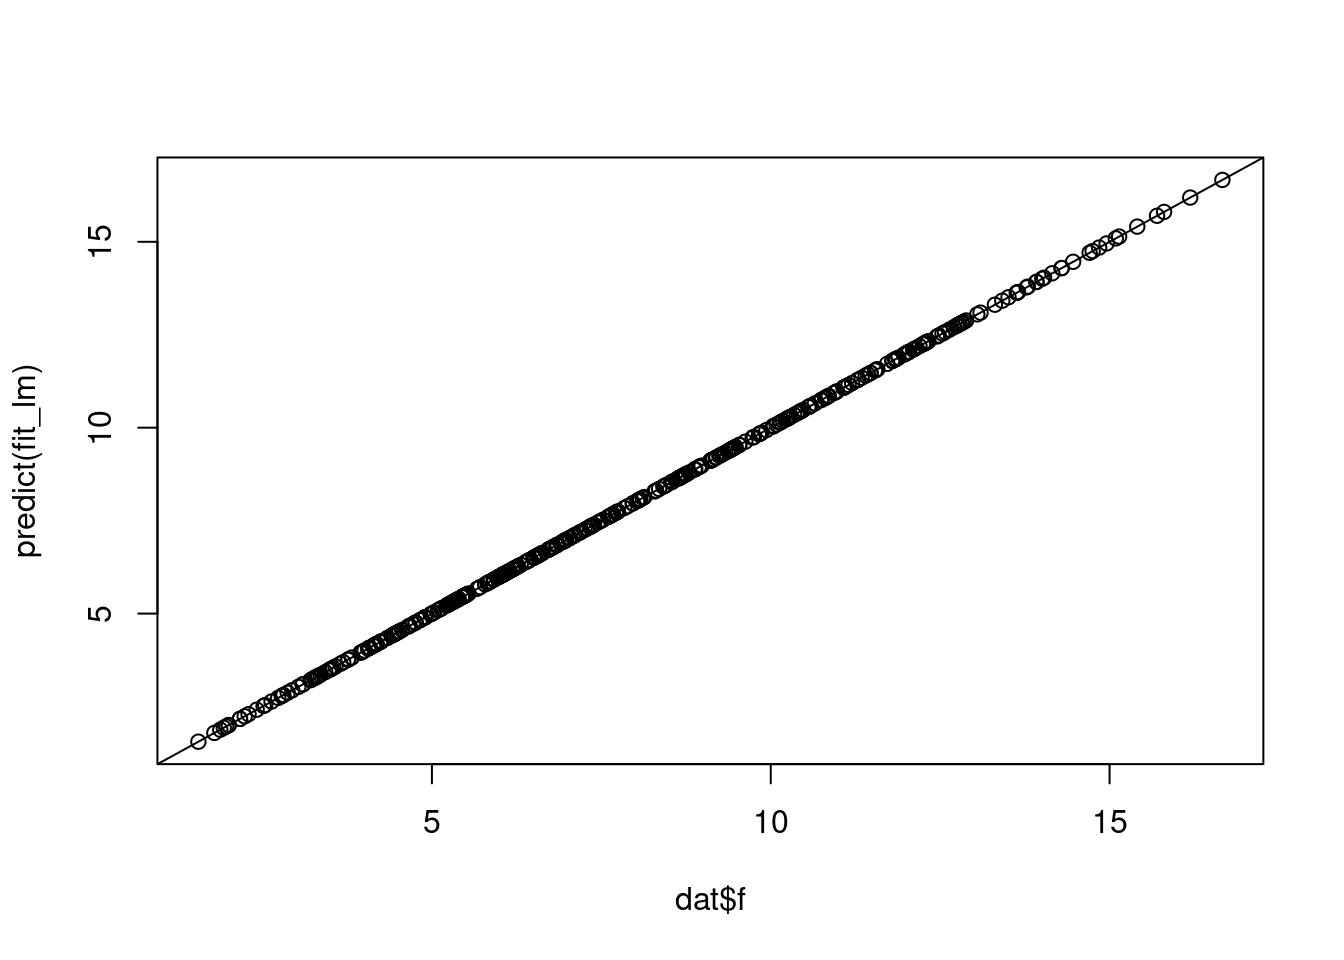 Prediction intervals for Generalized Additive Models (GAMs)